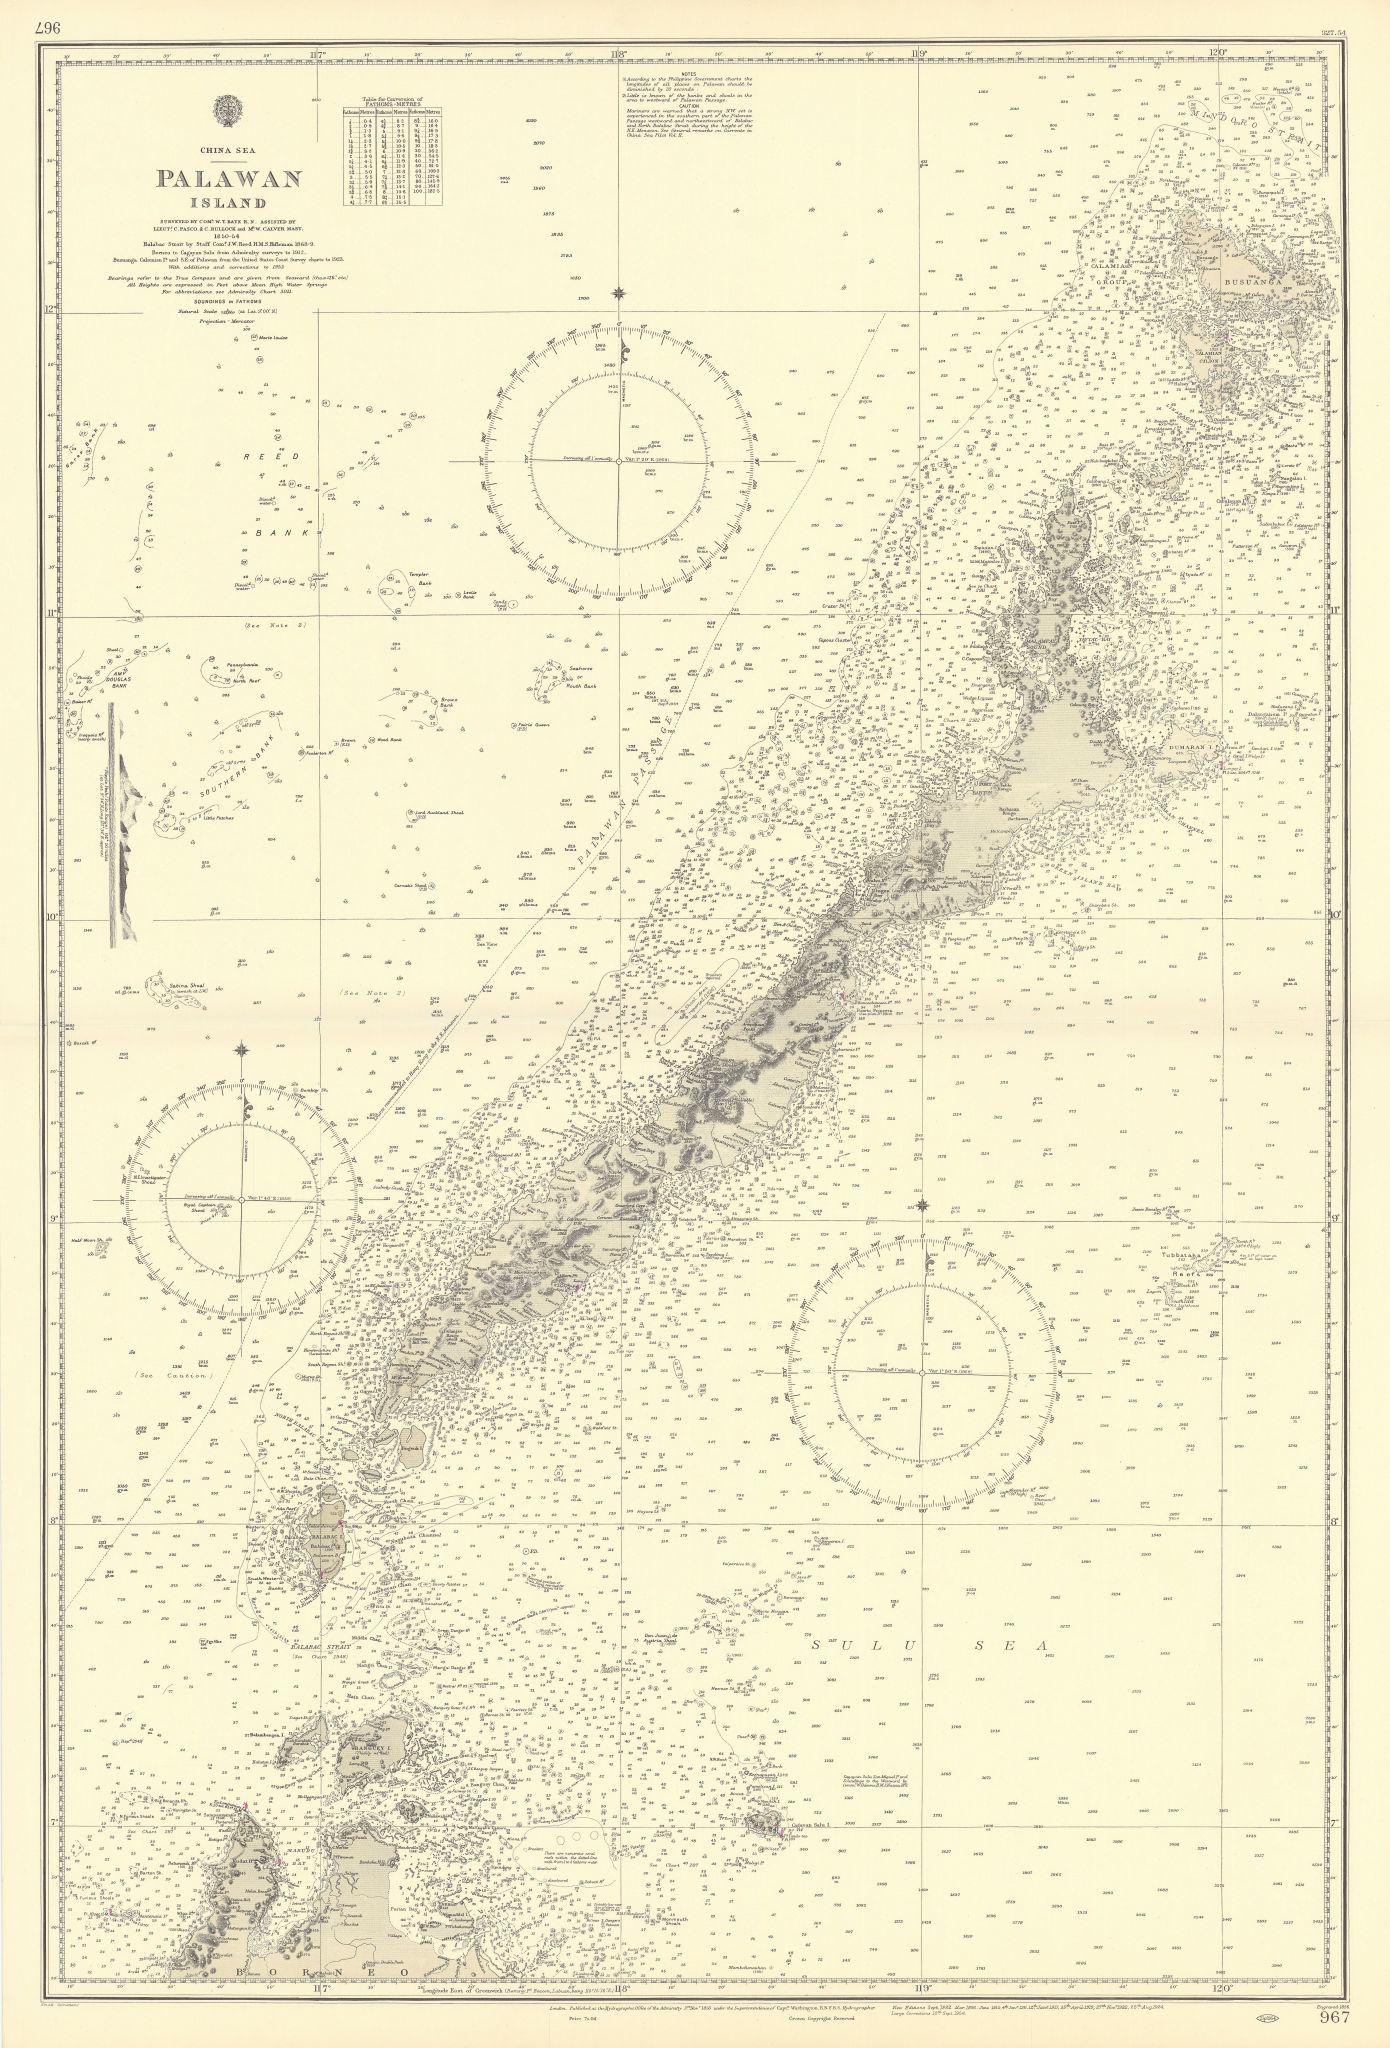 Palawan Island. Philippines. China Sea. ADMIRALTY sea chart 1856 (1954) map